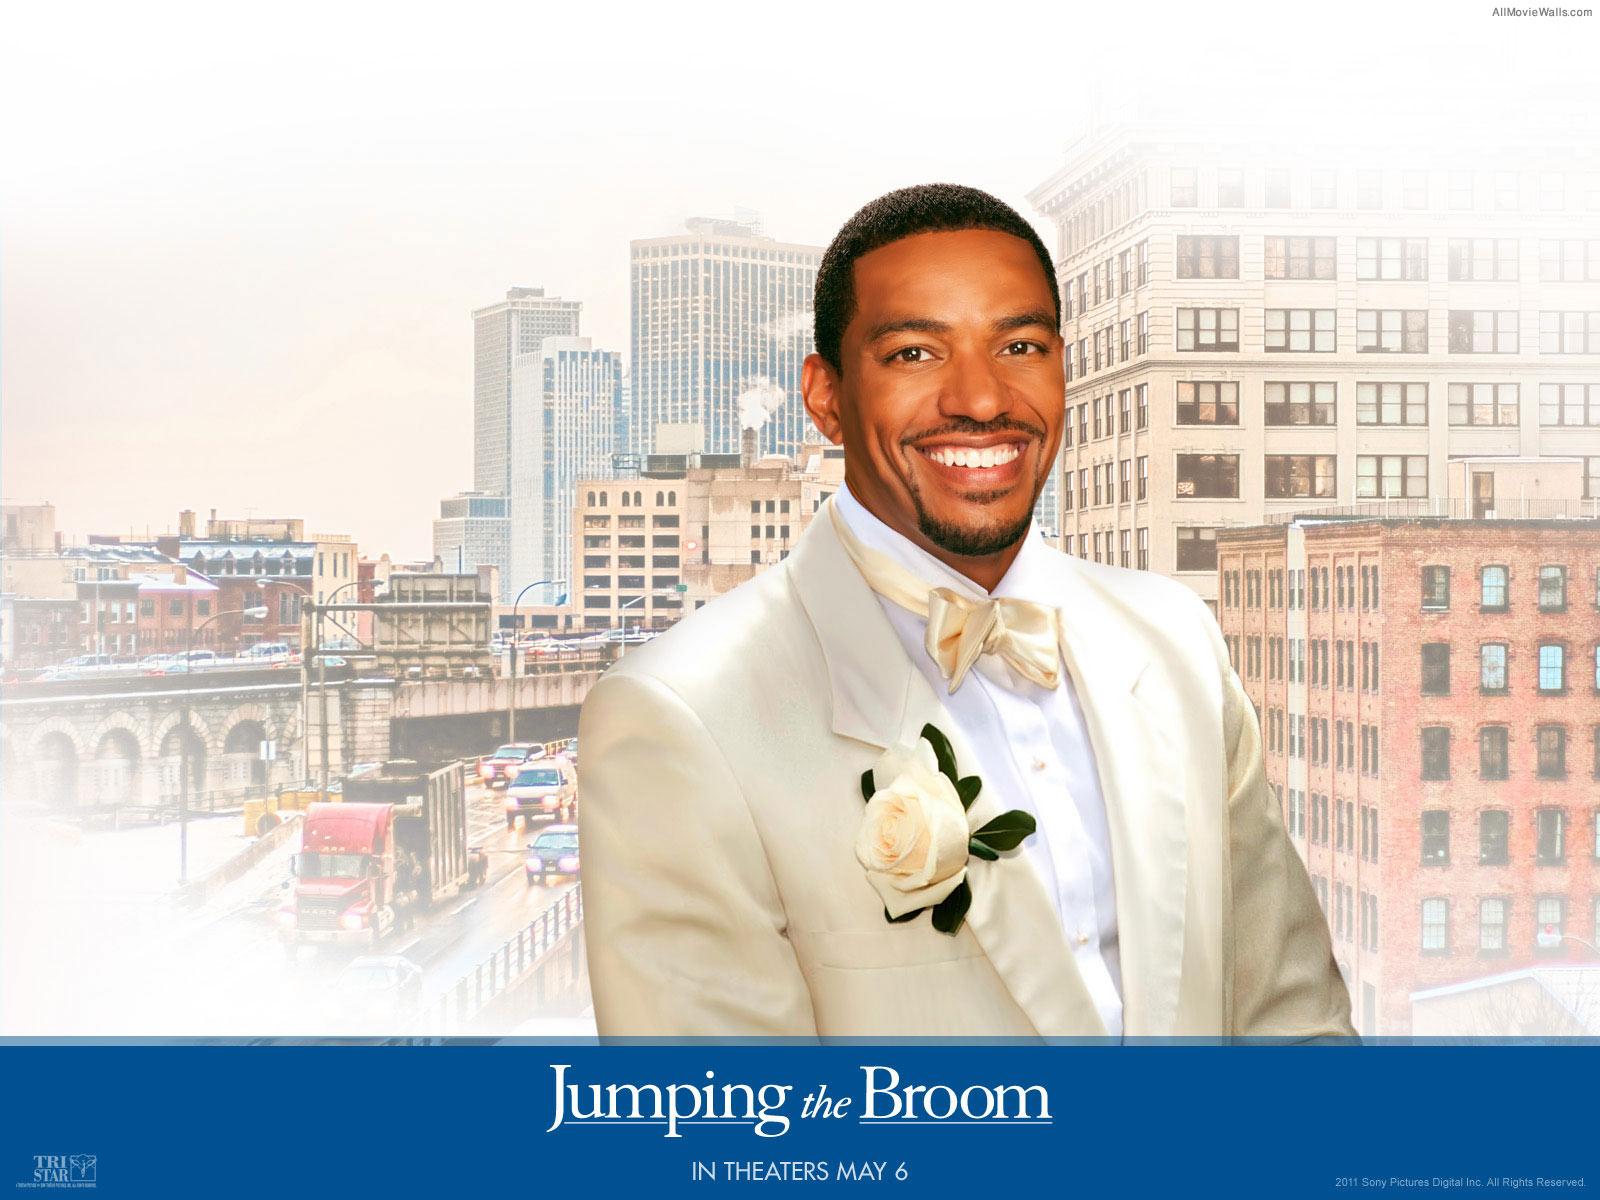 Jumping the Broom - Movies Wallpaper (25400432) - Fanpop